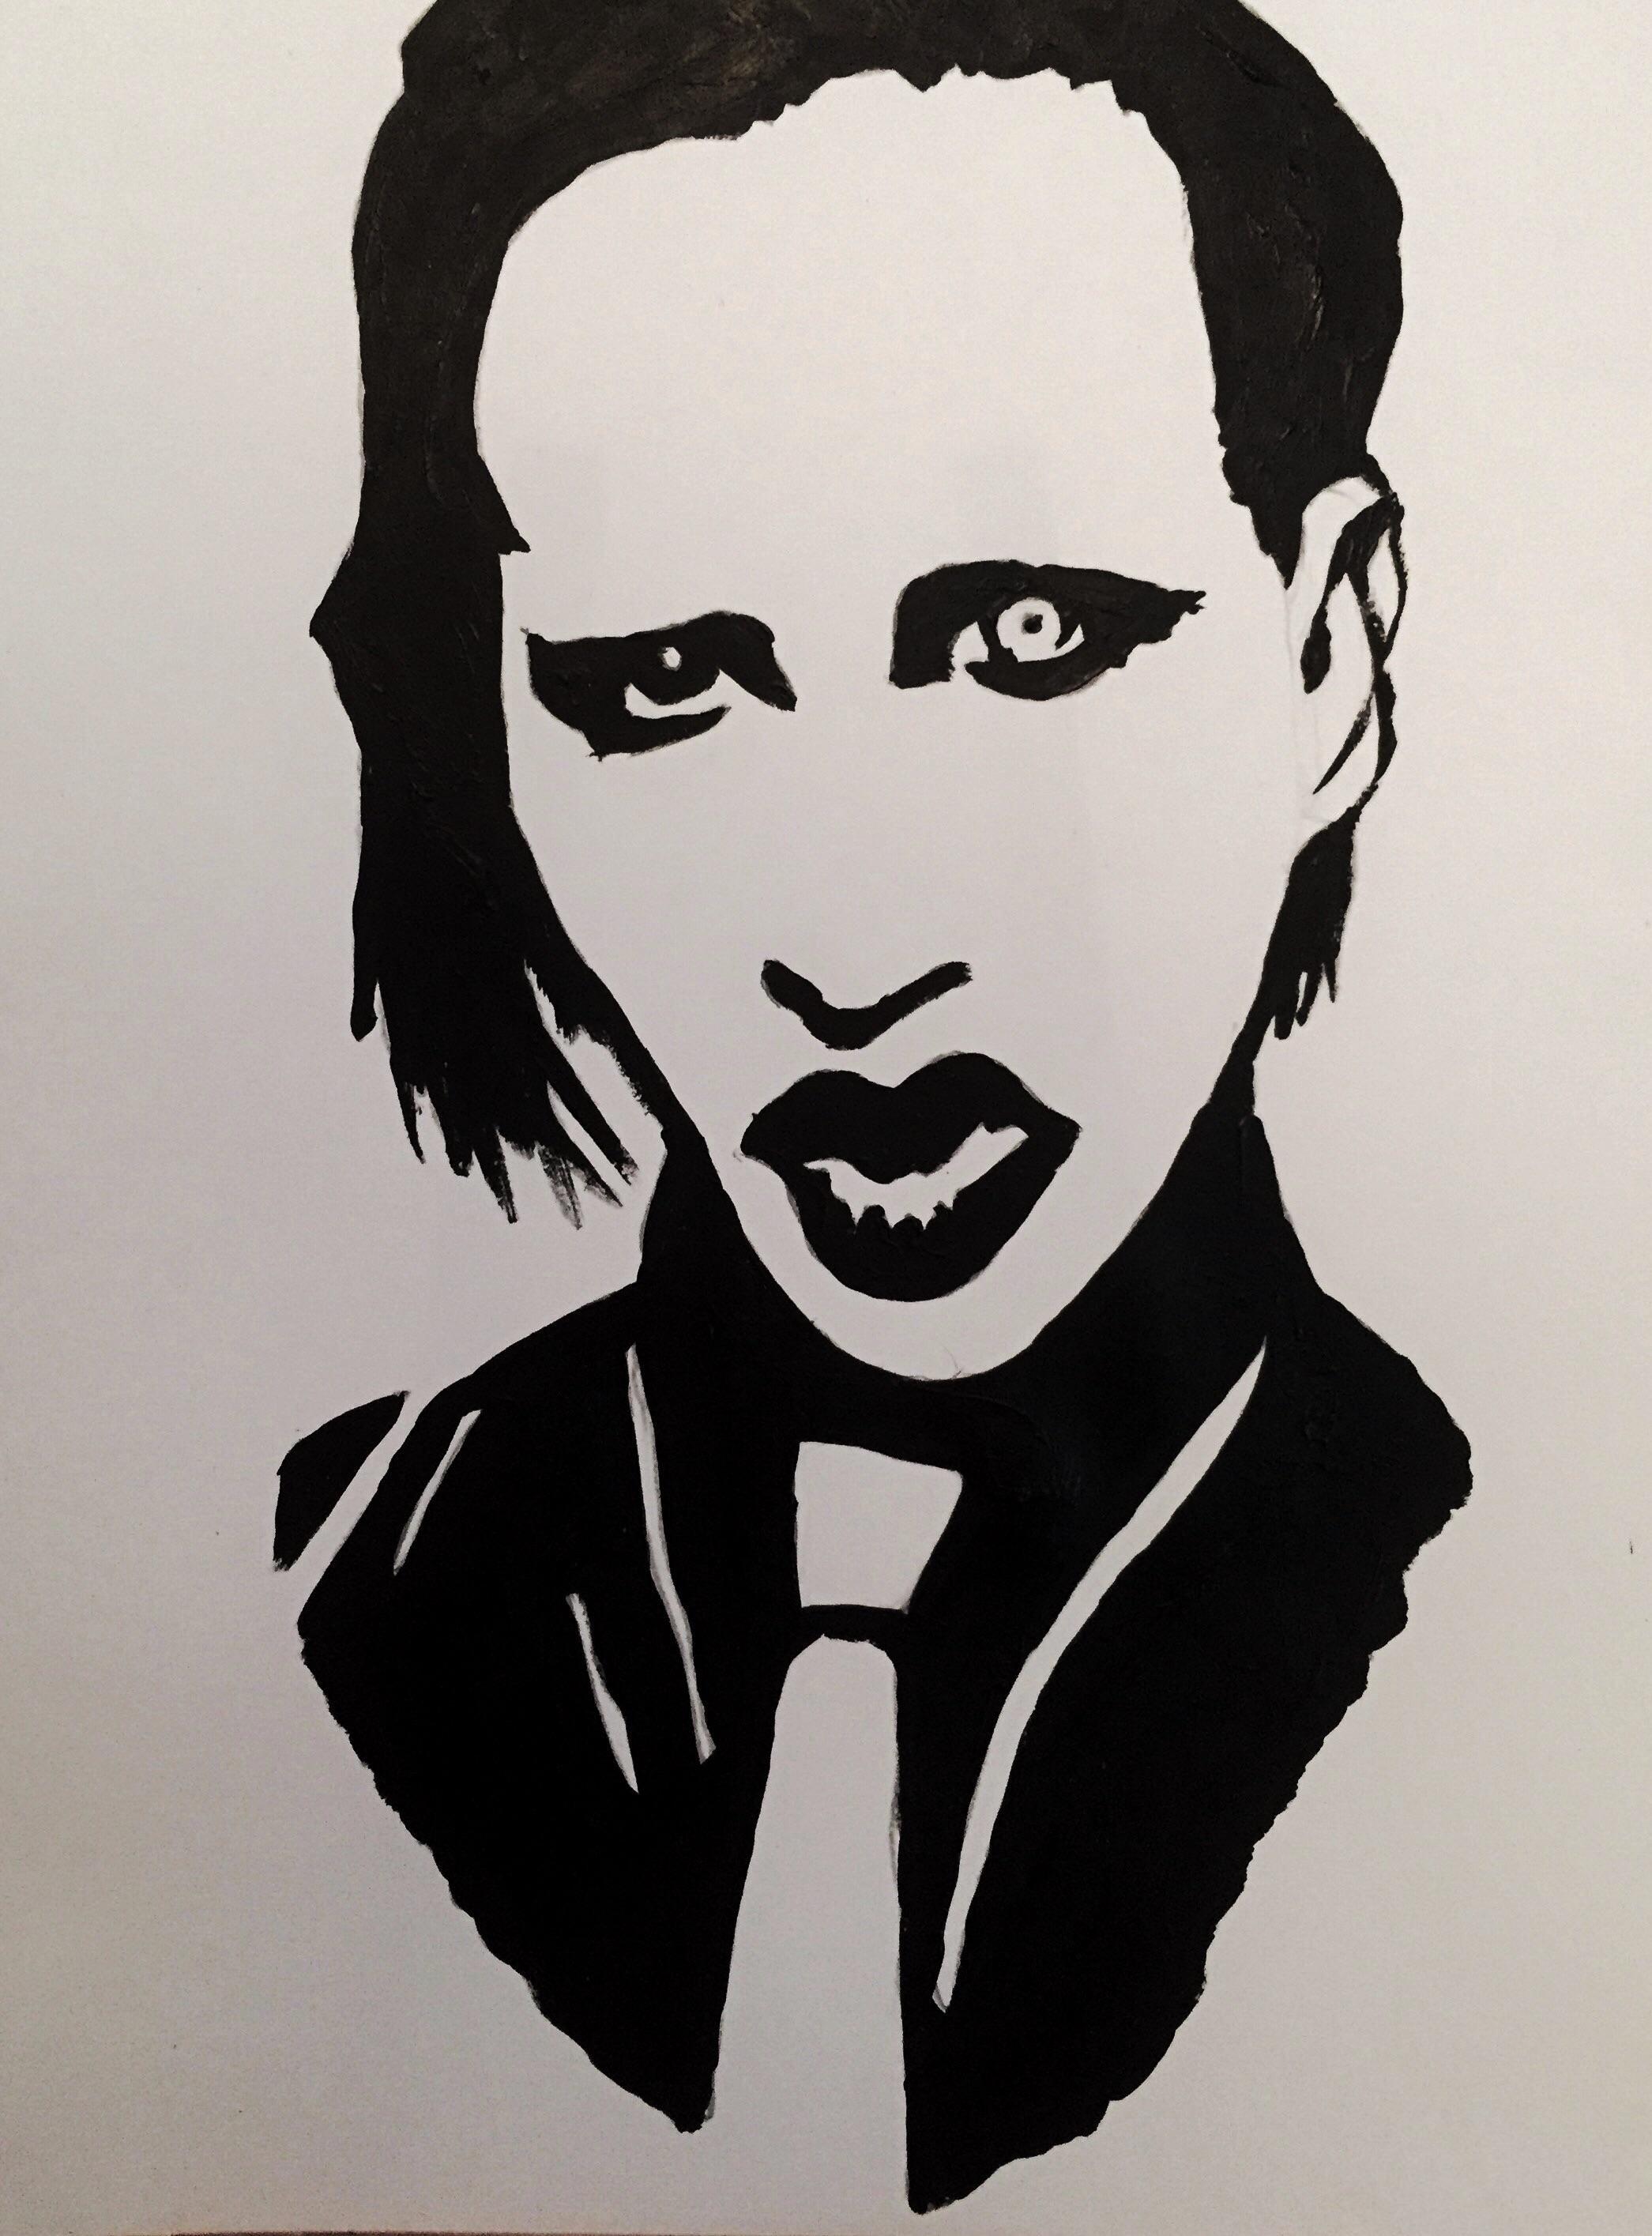 Marilyn Manson Acrylic 27x21cm Marilyn Manson Art Marilyn Manson Paintings Marilyn Manson Tattoo